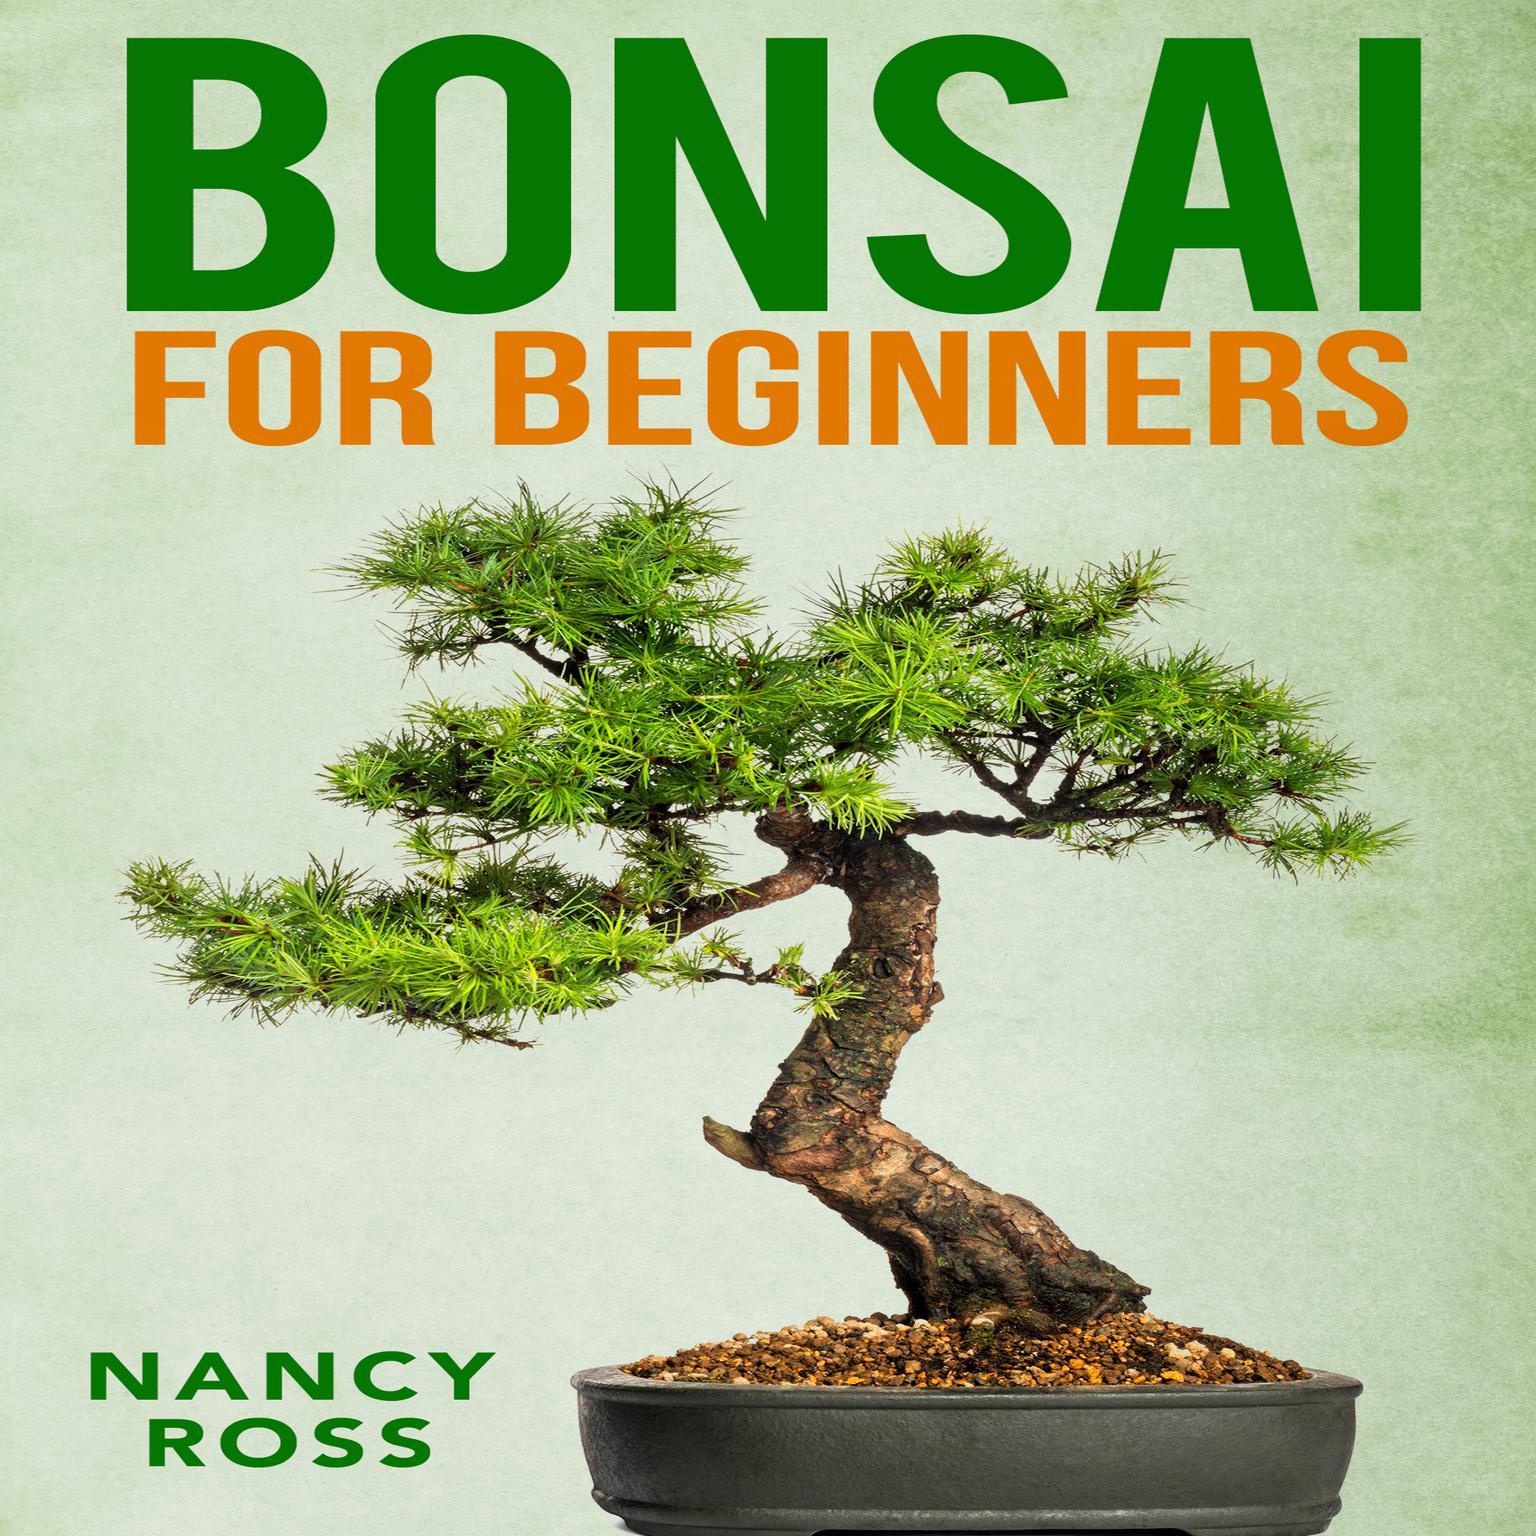 Bonsai for Beginners Audiobook, by Nancy Ross